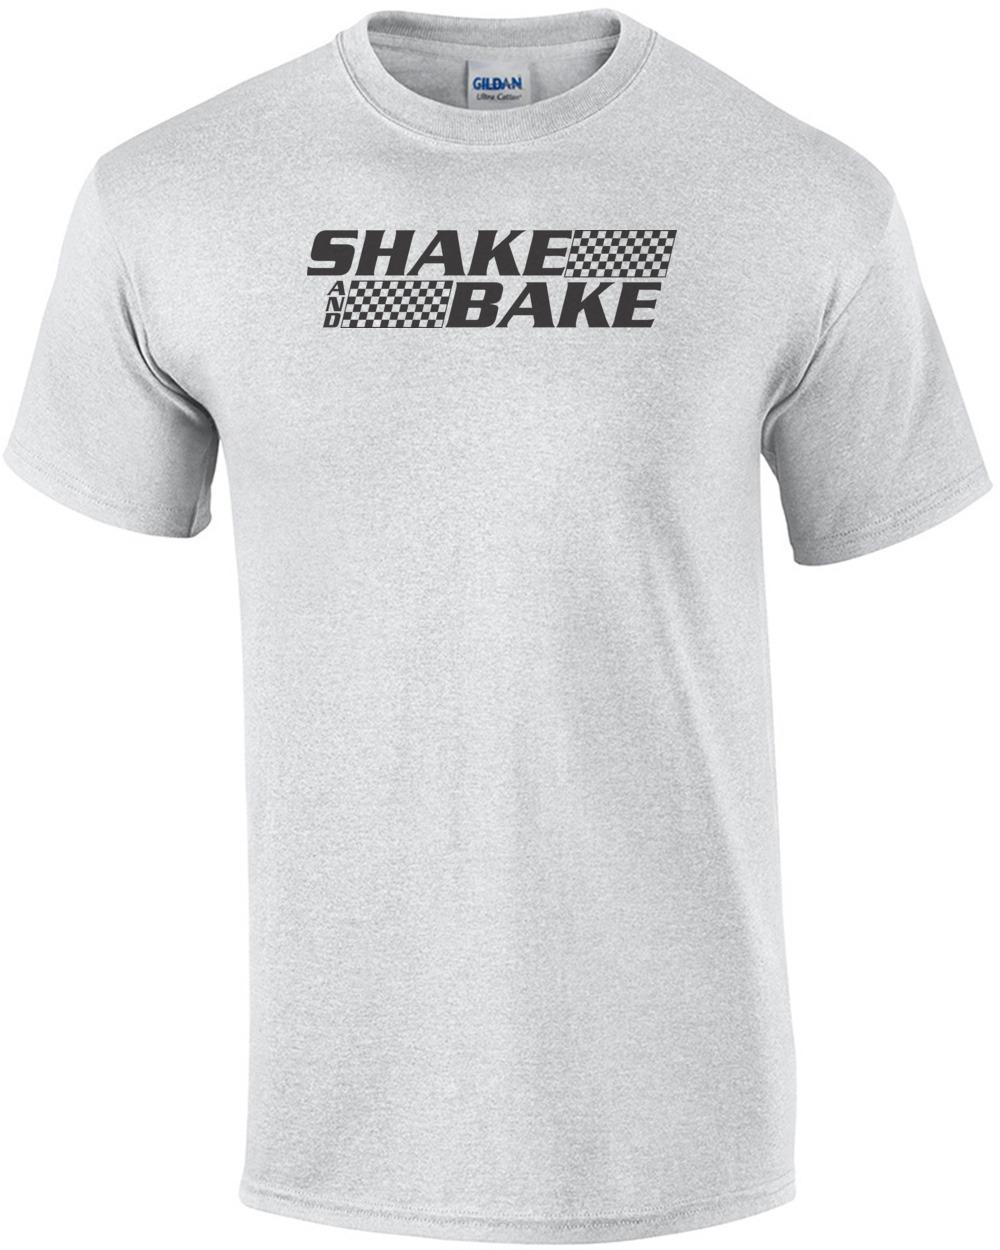 4e530118 shake-and-bake-tshirt--mens-regular-ash.jpg